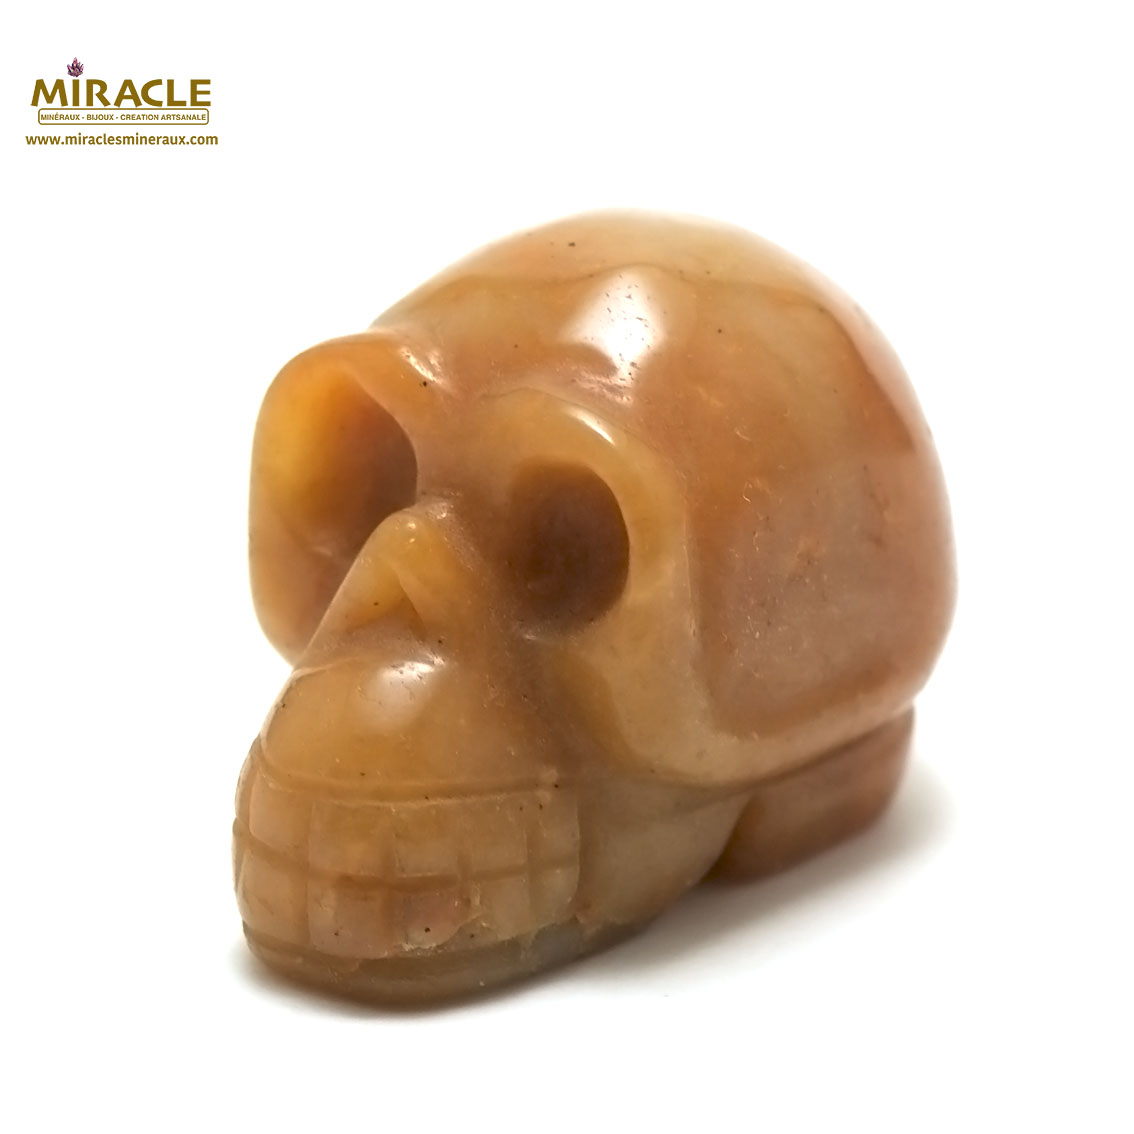 statuette minéraux  crane skull en pierre naturelle d\'aventurine orange